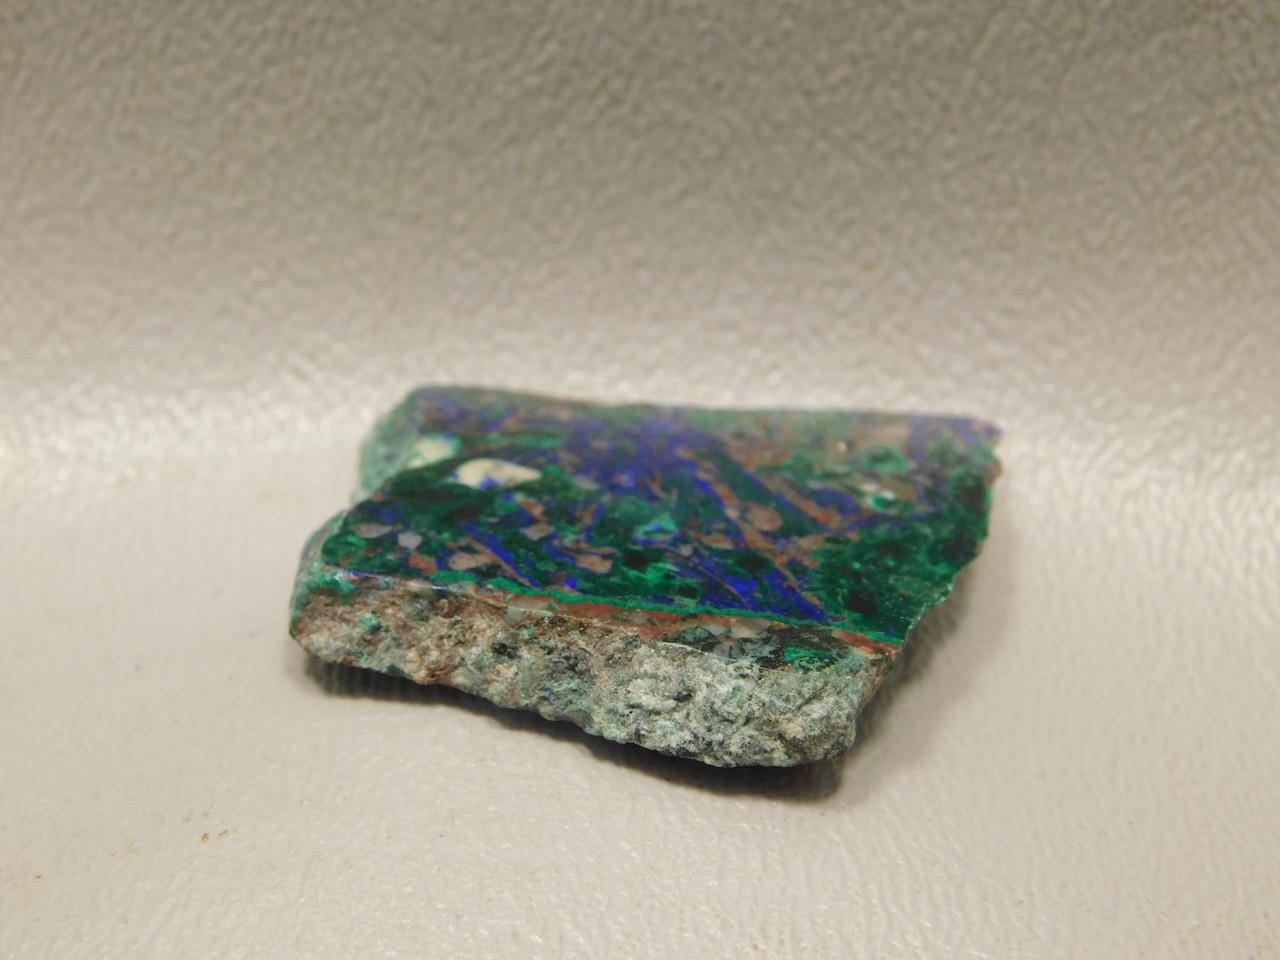 Azurite Malachite Natural Freeform Small Polished Slab Cabochon #S21